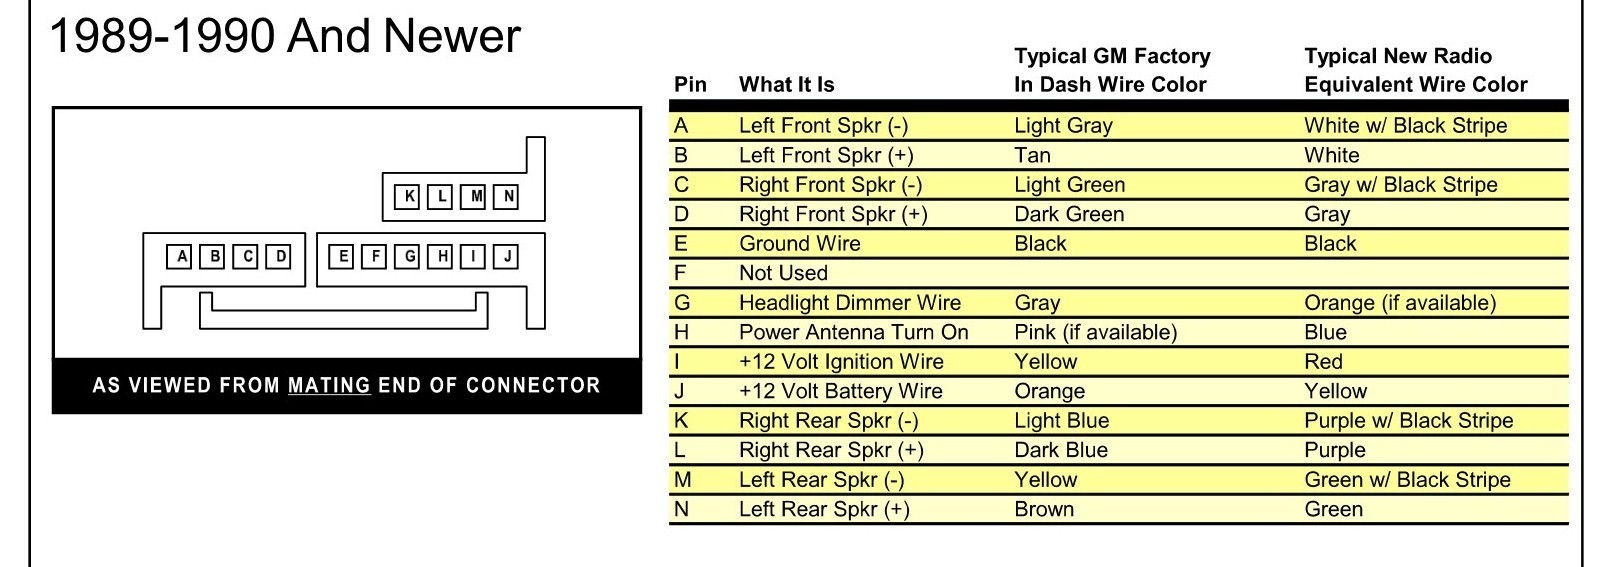 2005 chevy cavalier radio wiring diagram 2005 chevy cavalier stereo rh  parsplus co 2005 chevrolet malibu